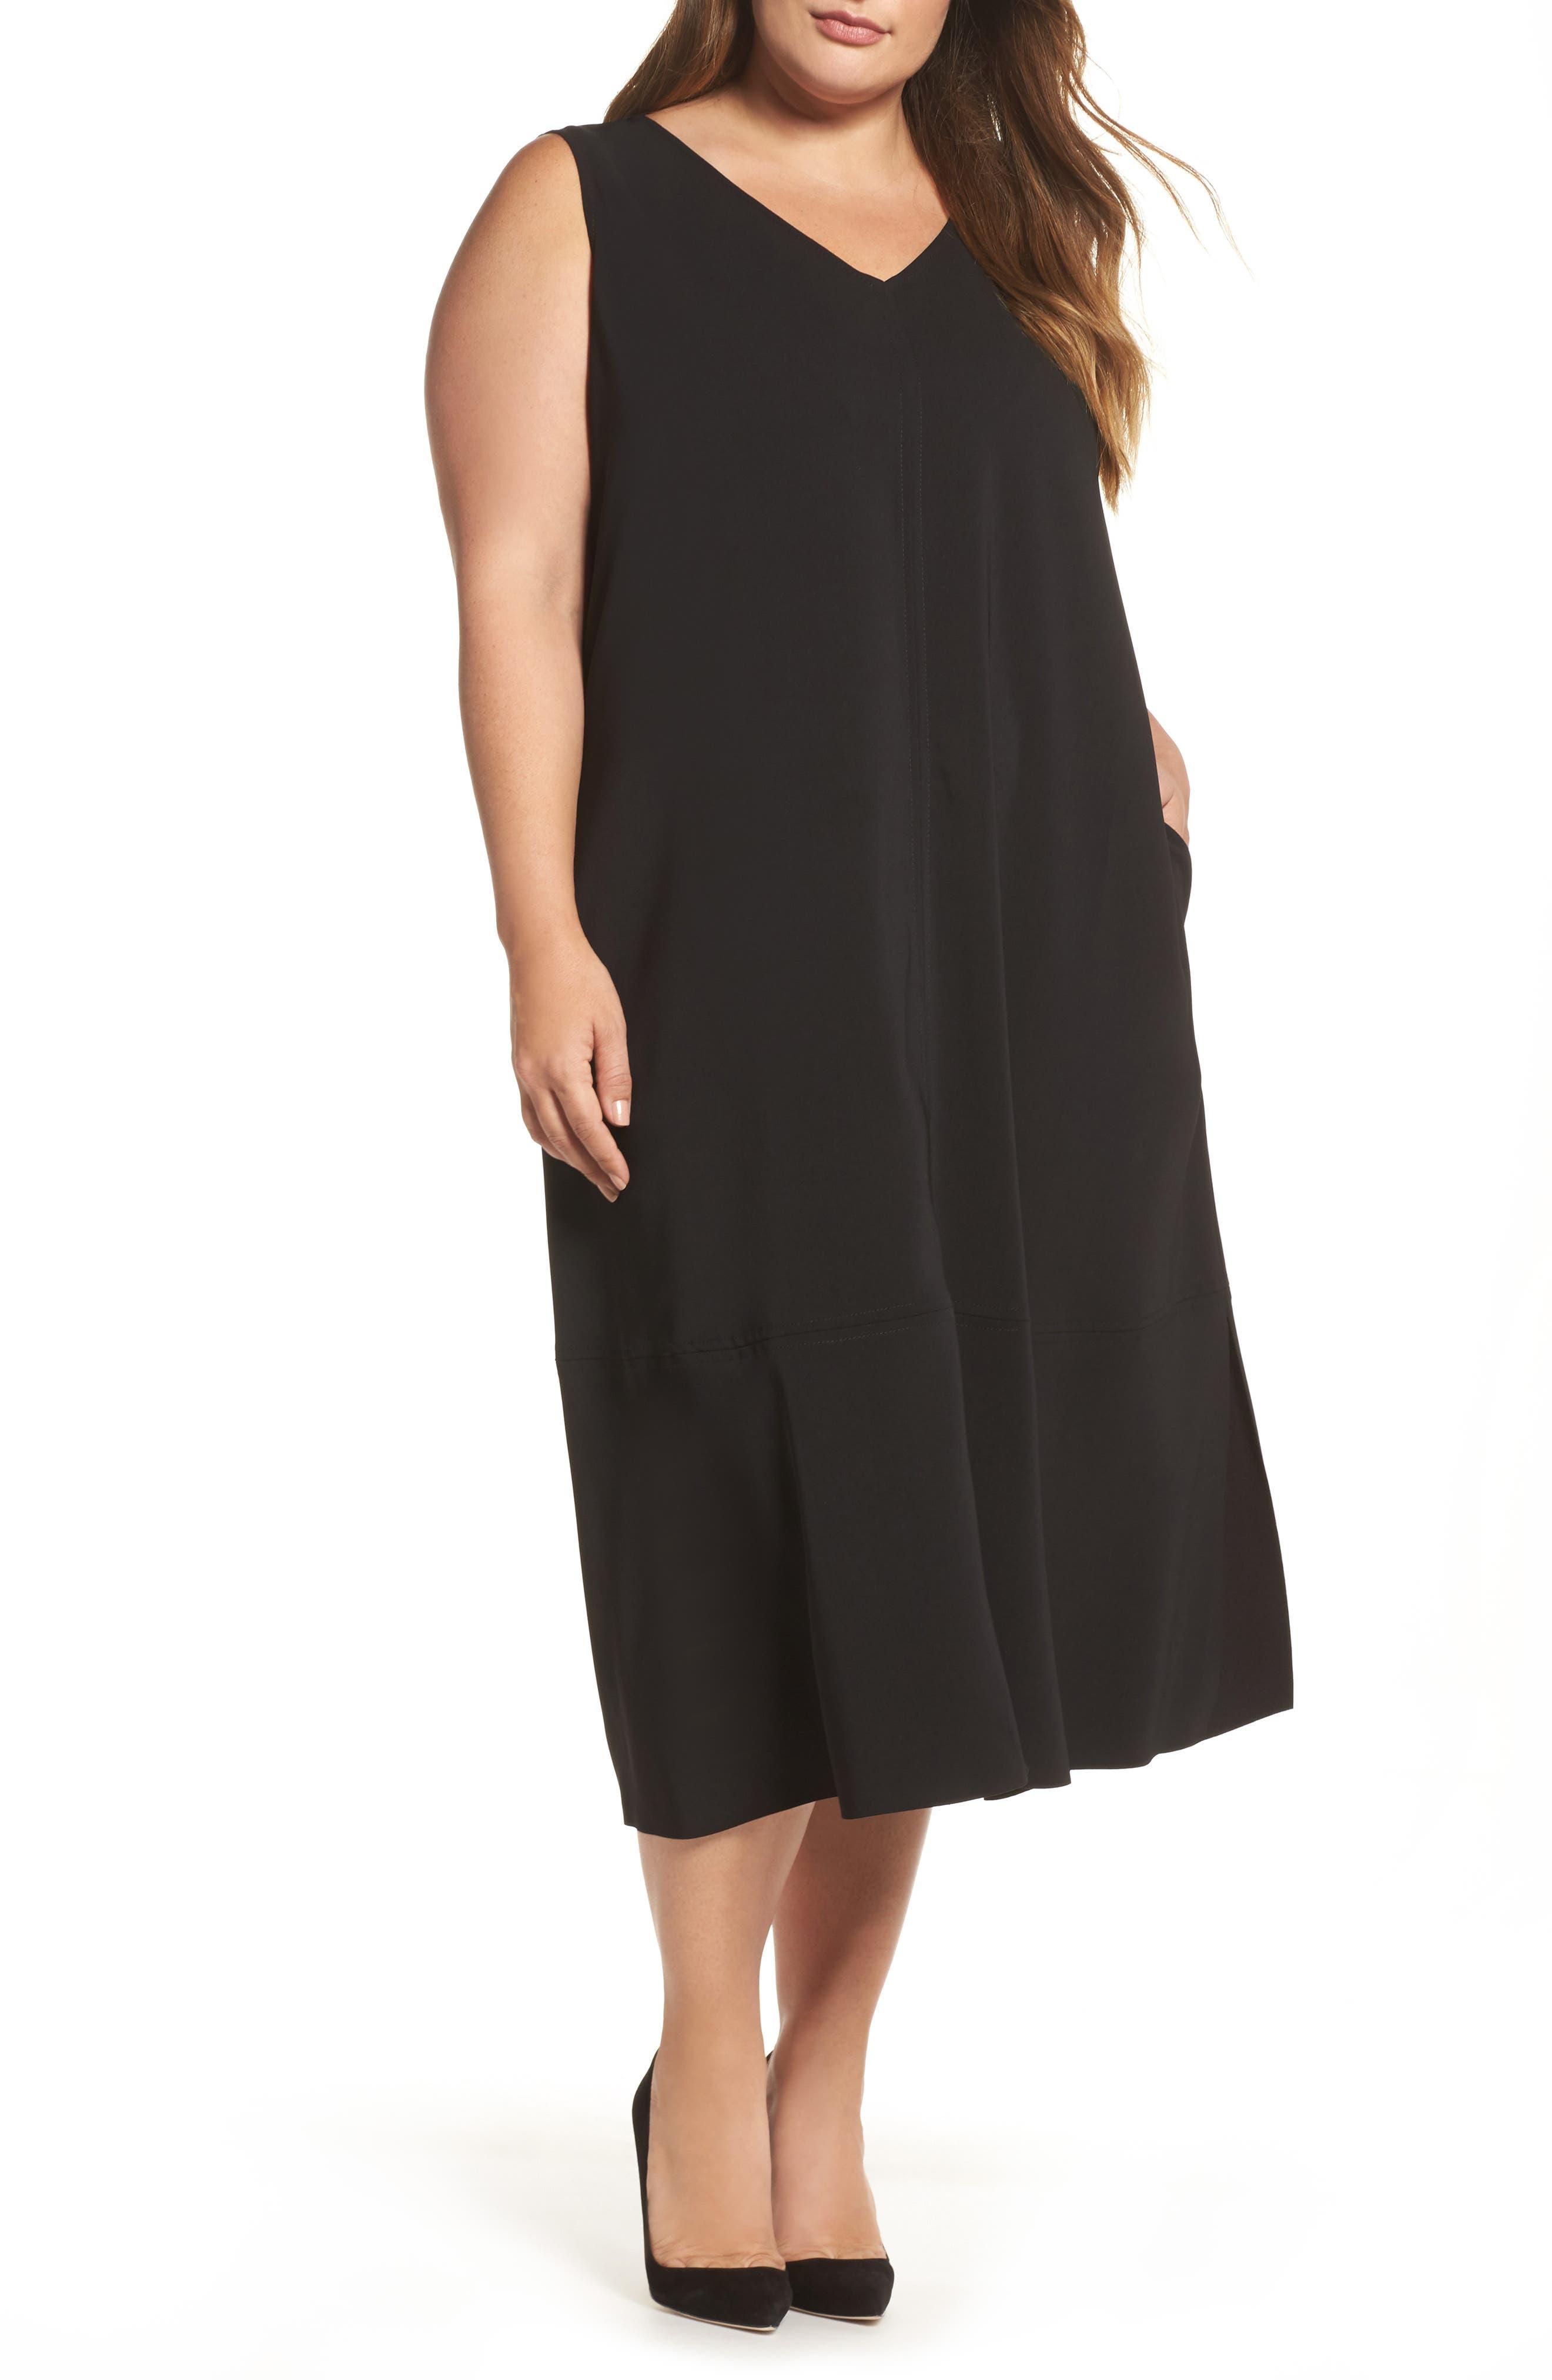 Donna Sleeveless Maxi Dress,                             Main thumbnail 1, color,                             001